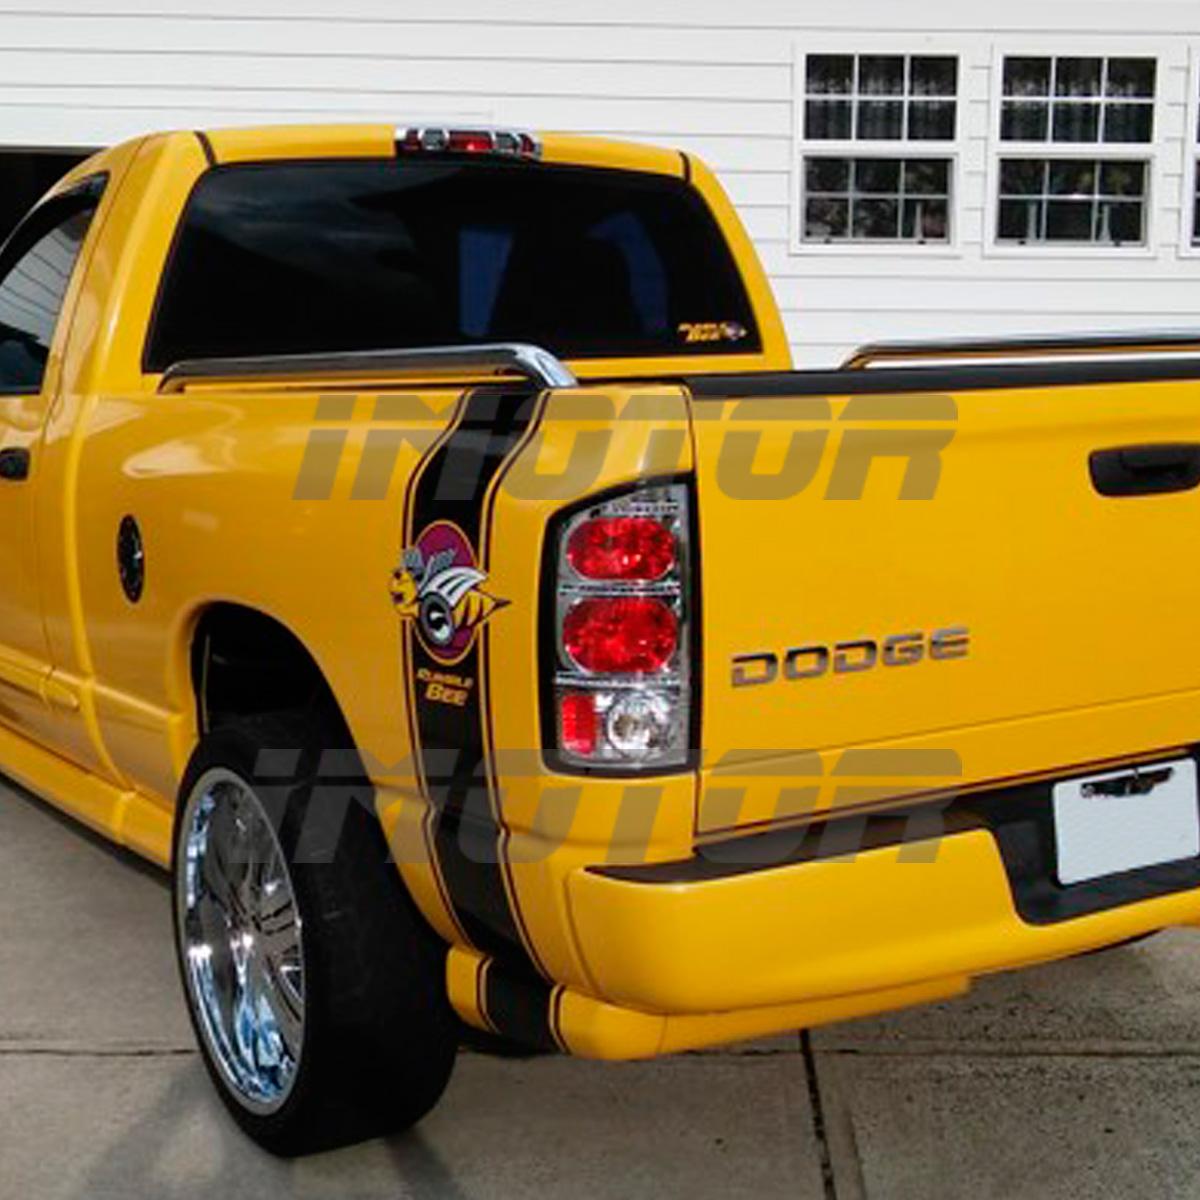 2002 2003 2004 2005 2006 Dodge Ram 1500/2500/3500 Truck